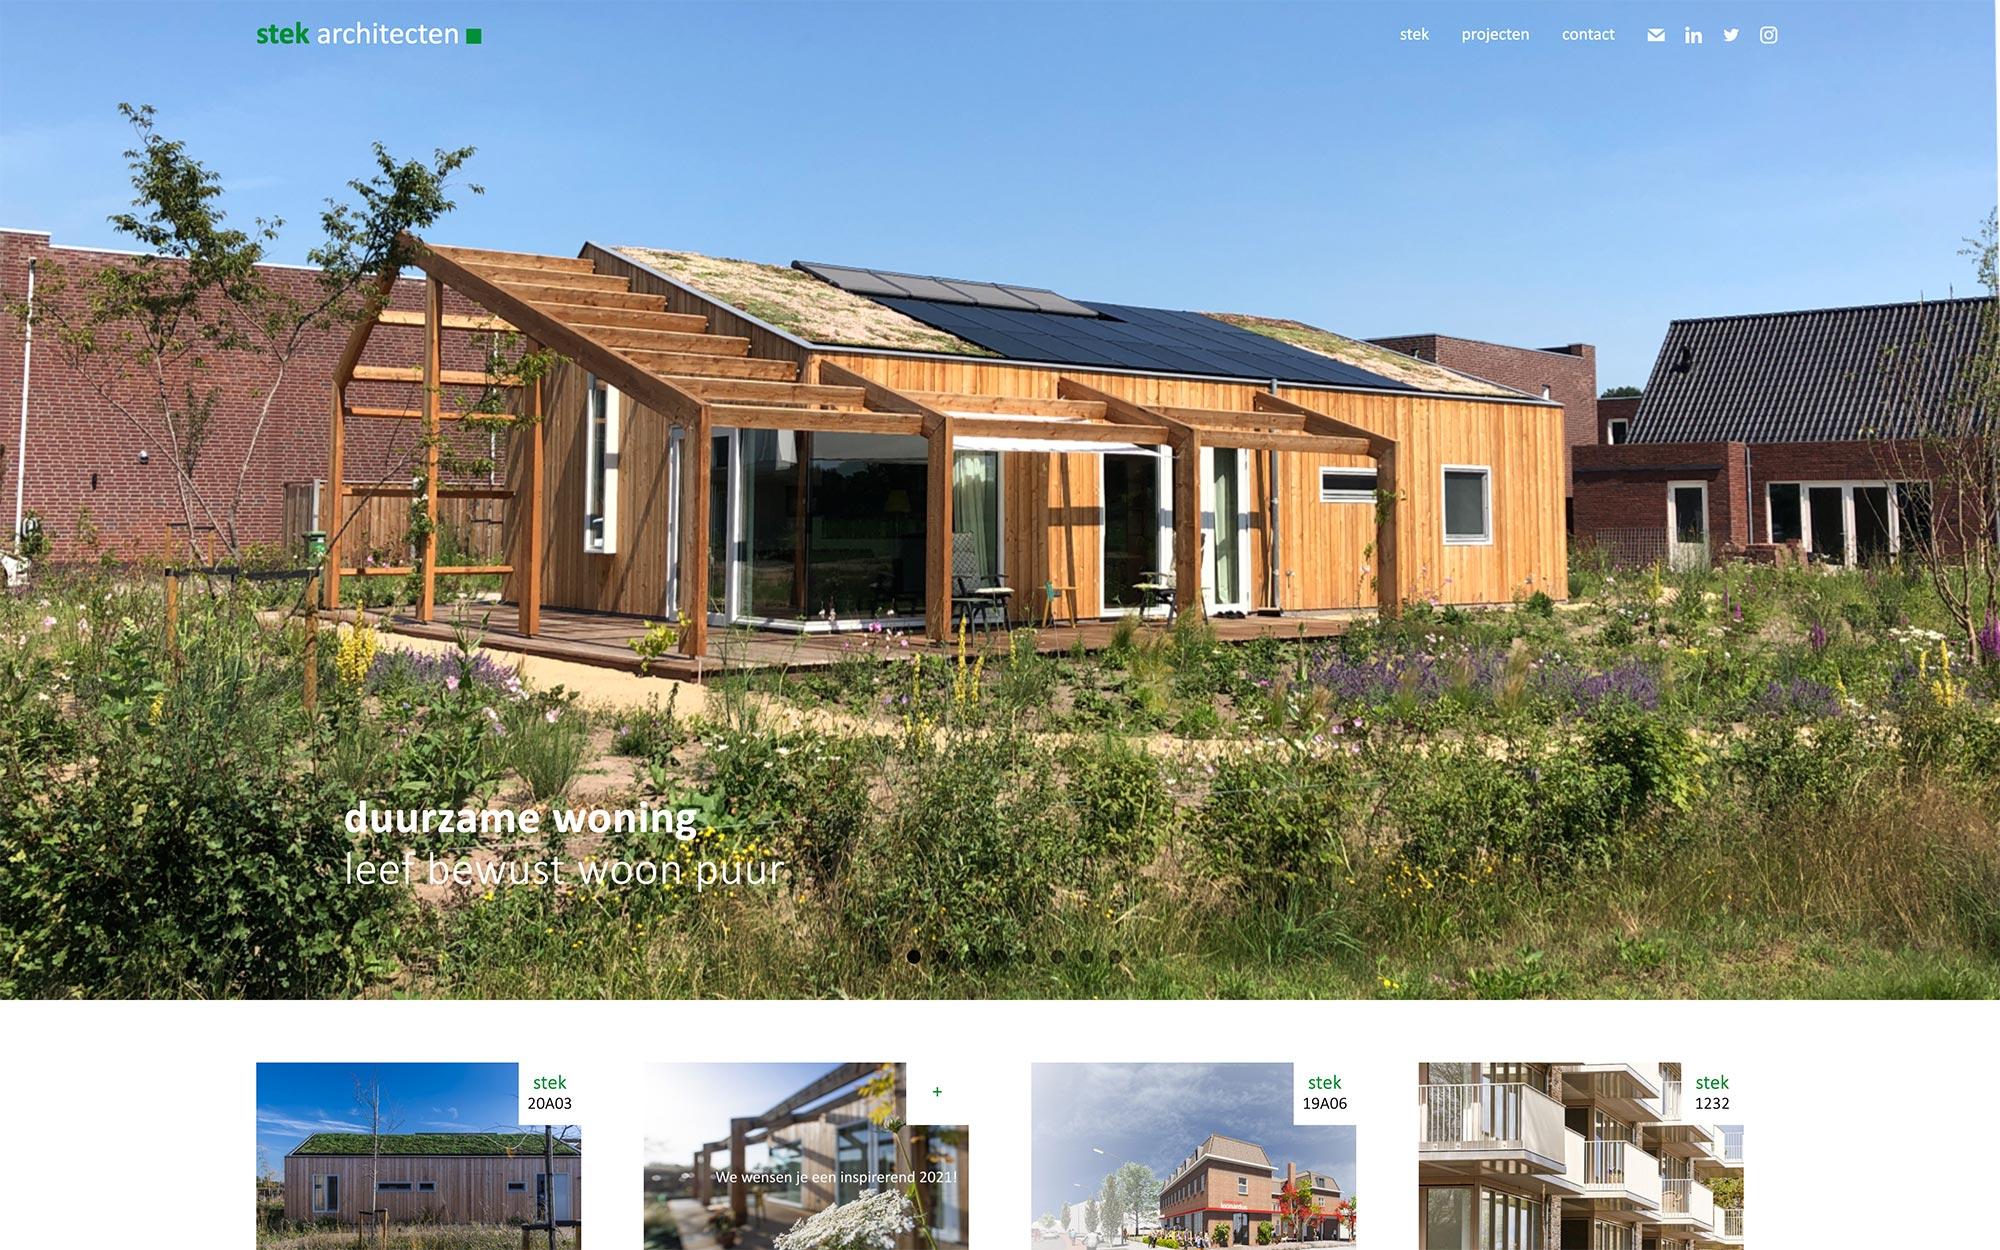 stek architecten website JAgd ontwerp